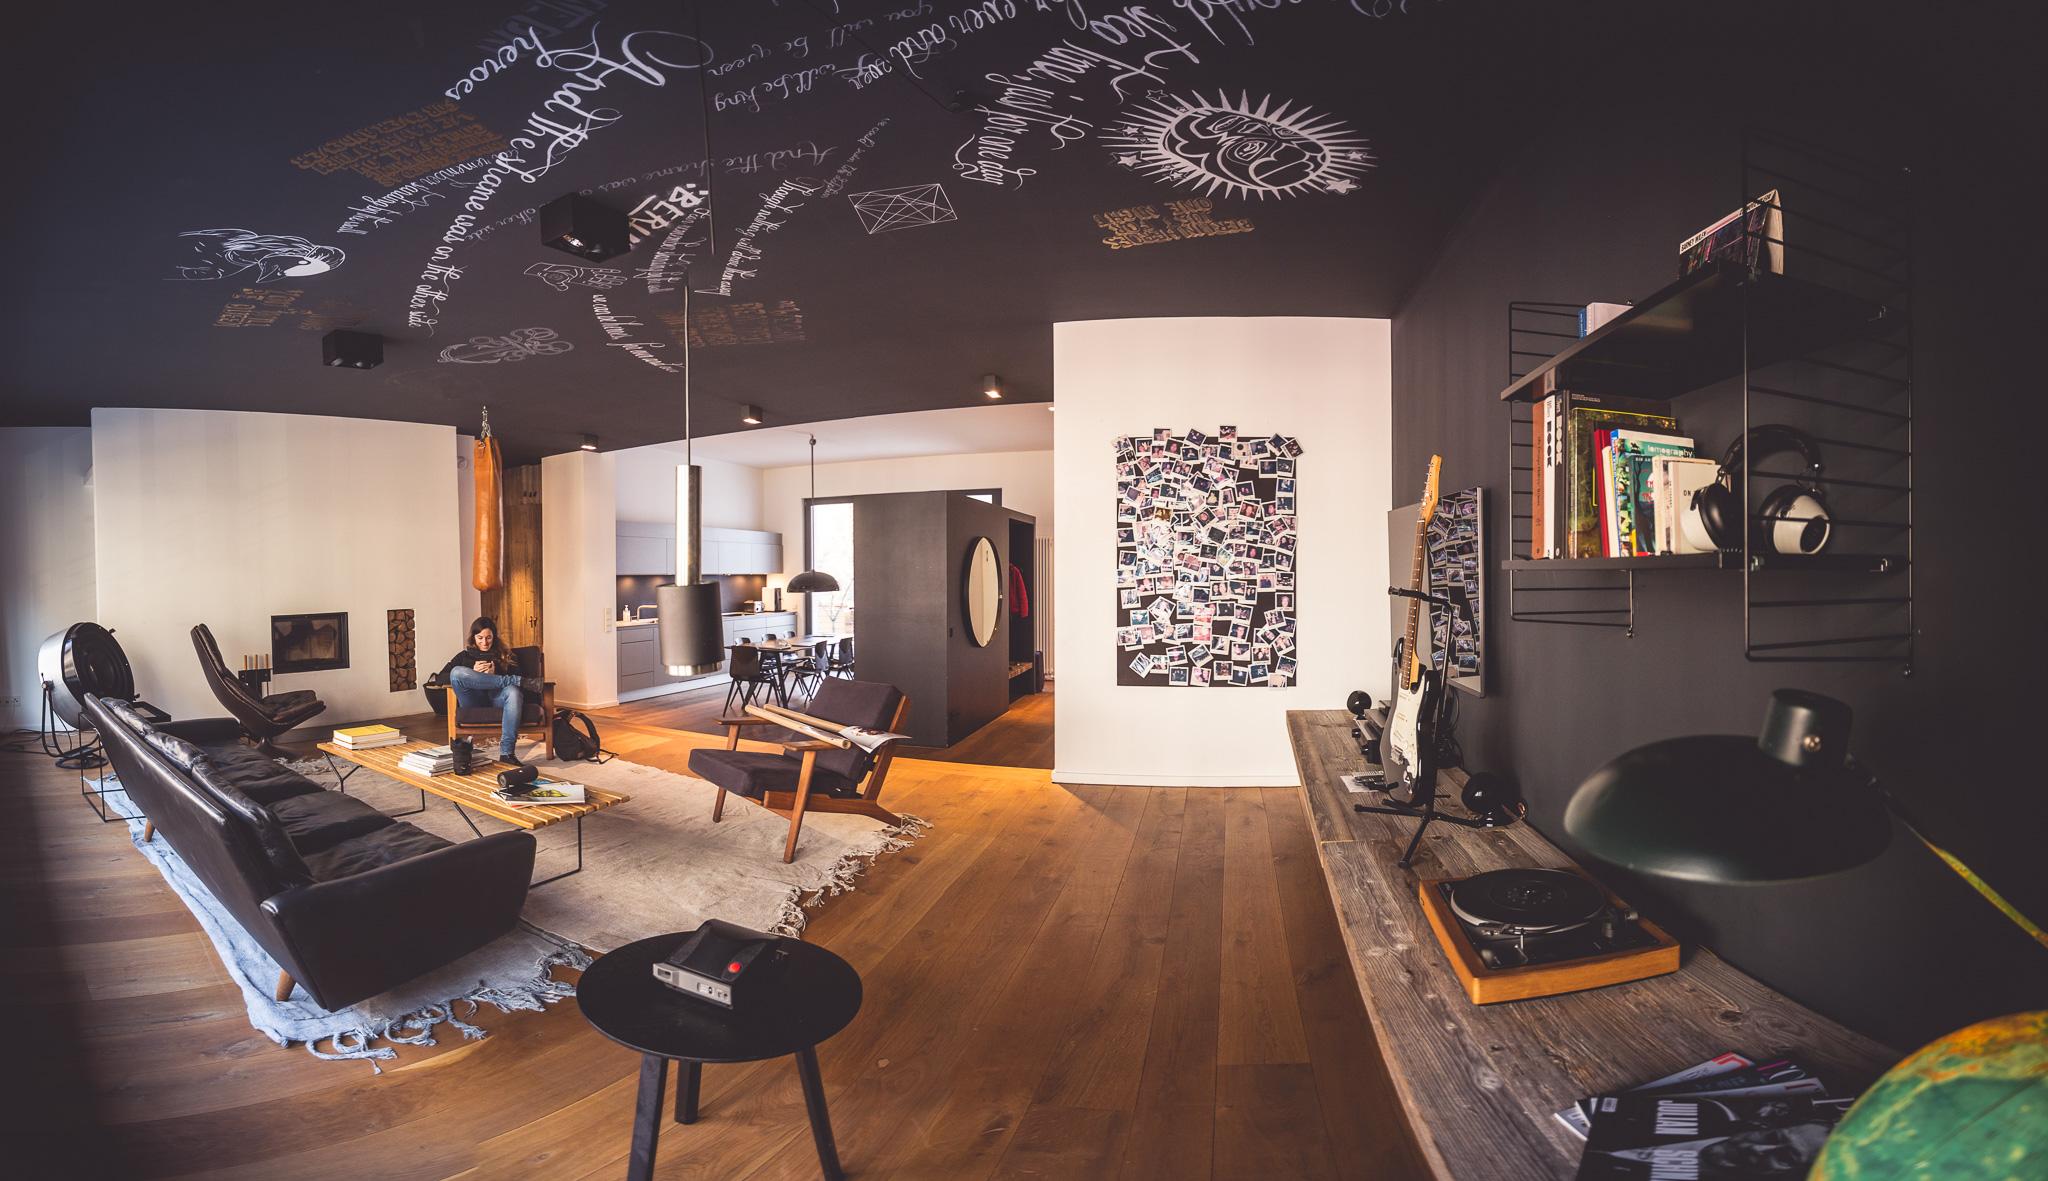 The NOMADS Berlin, plenty of room for creativity